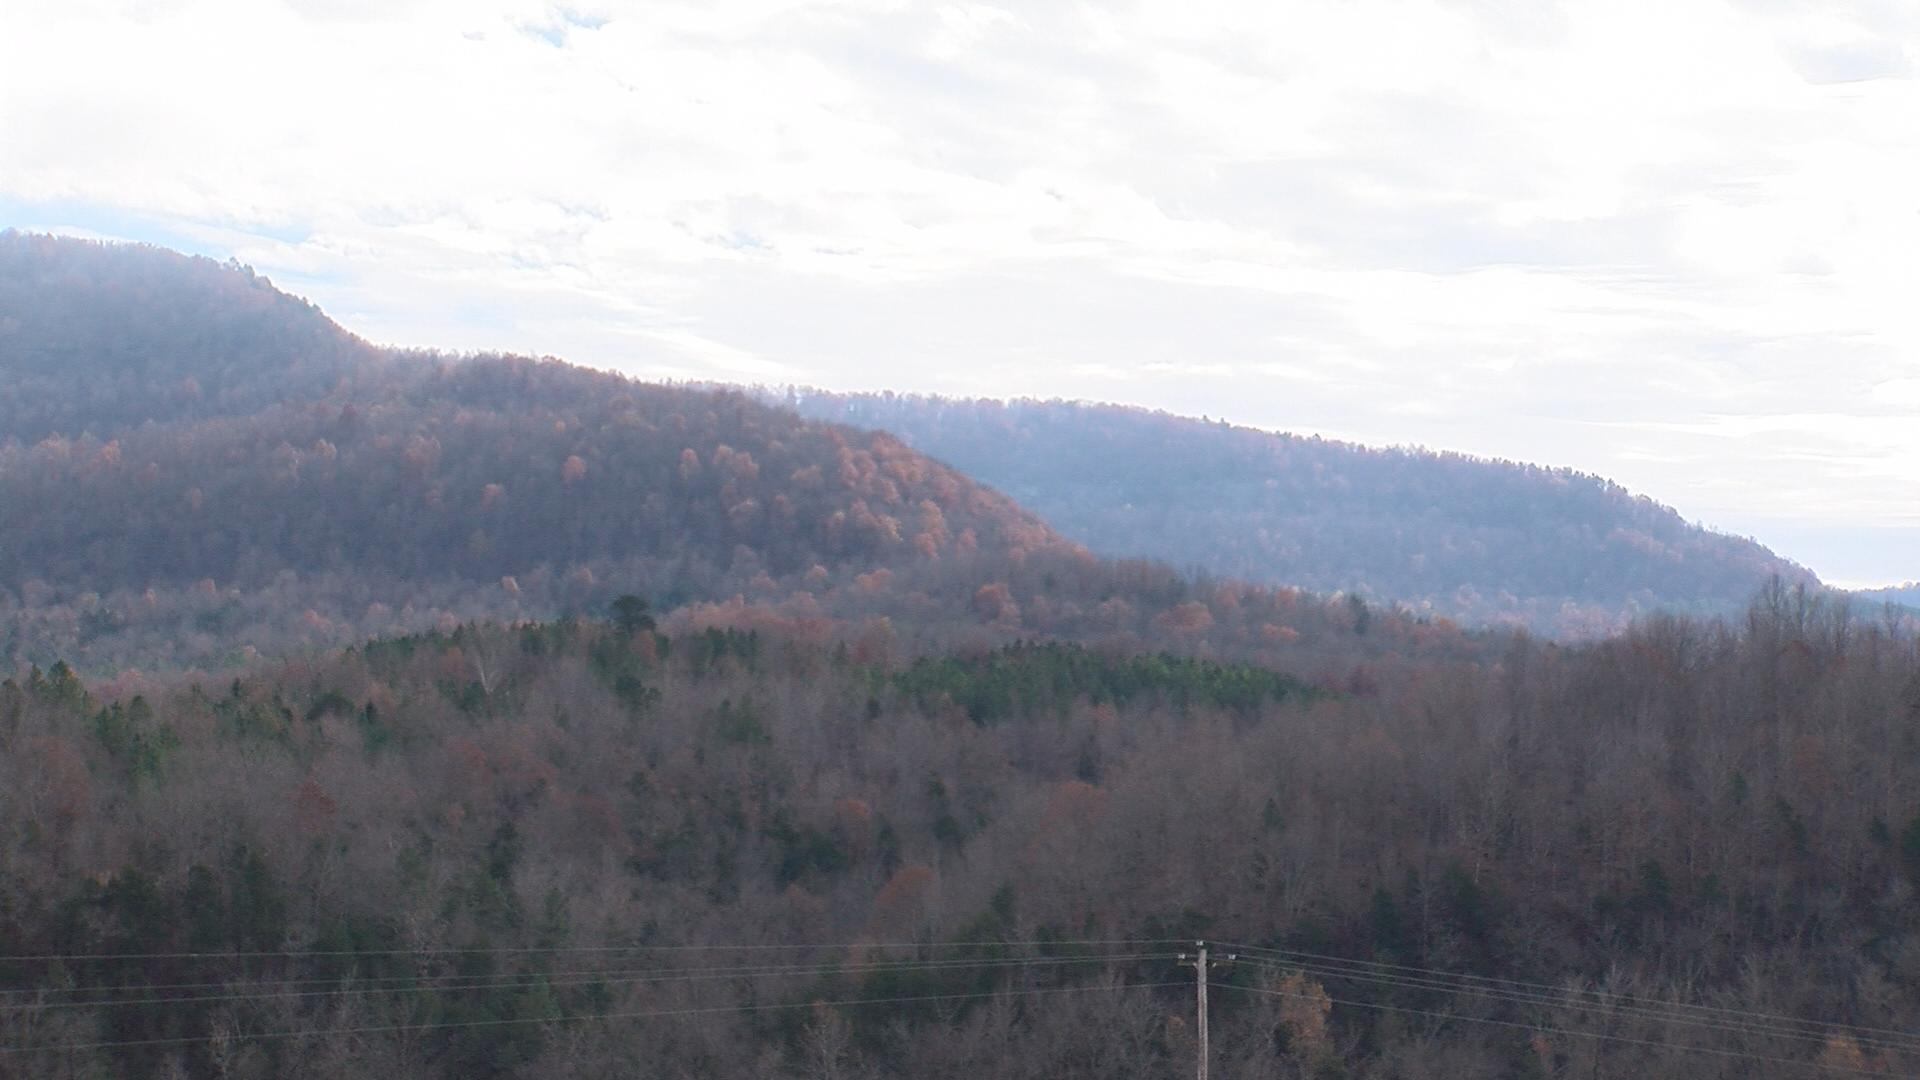 Council Rock Forest